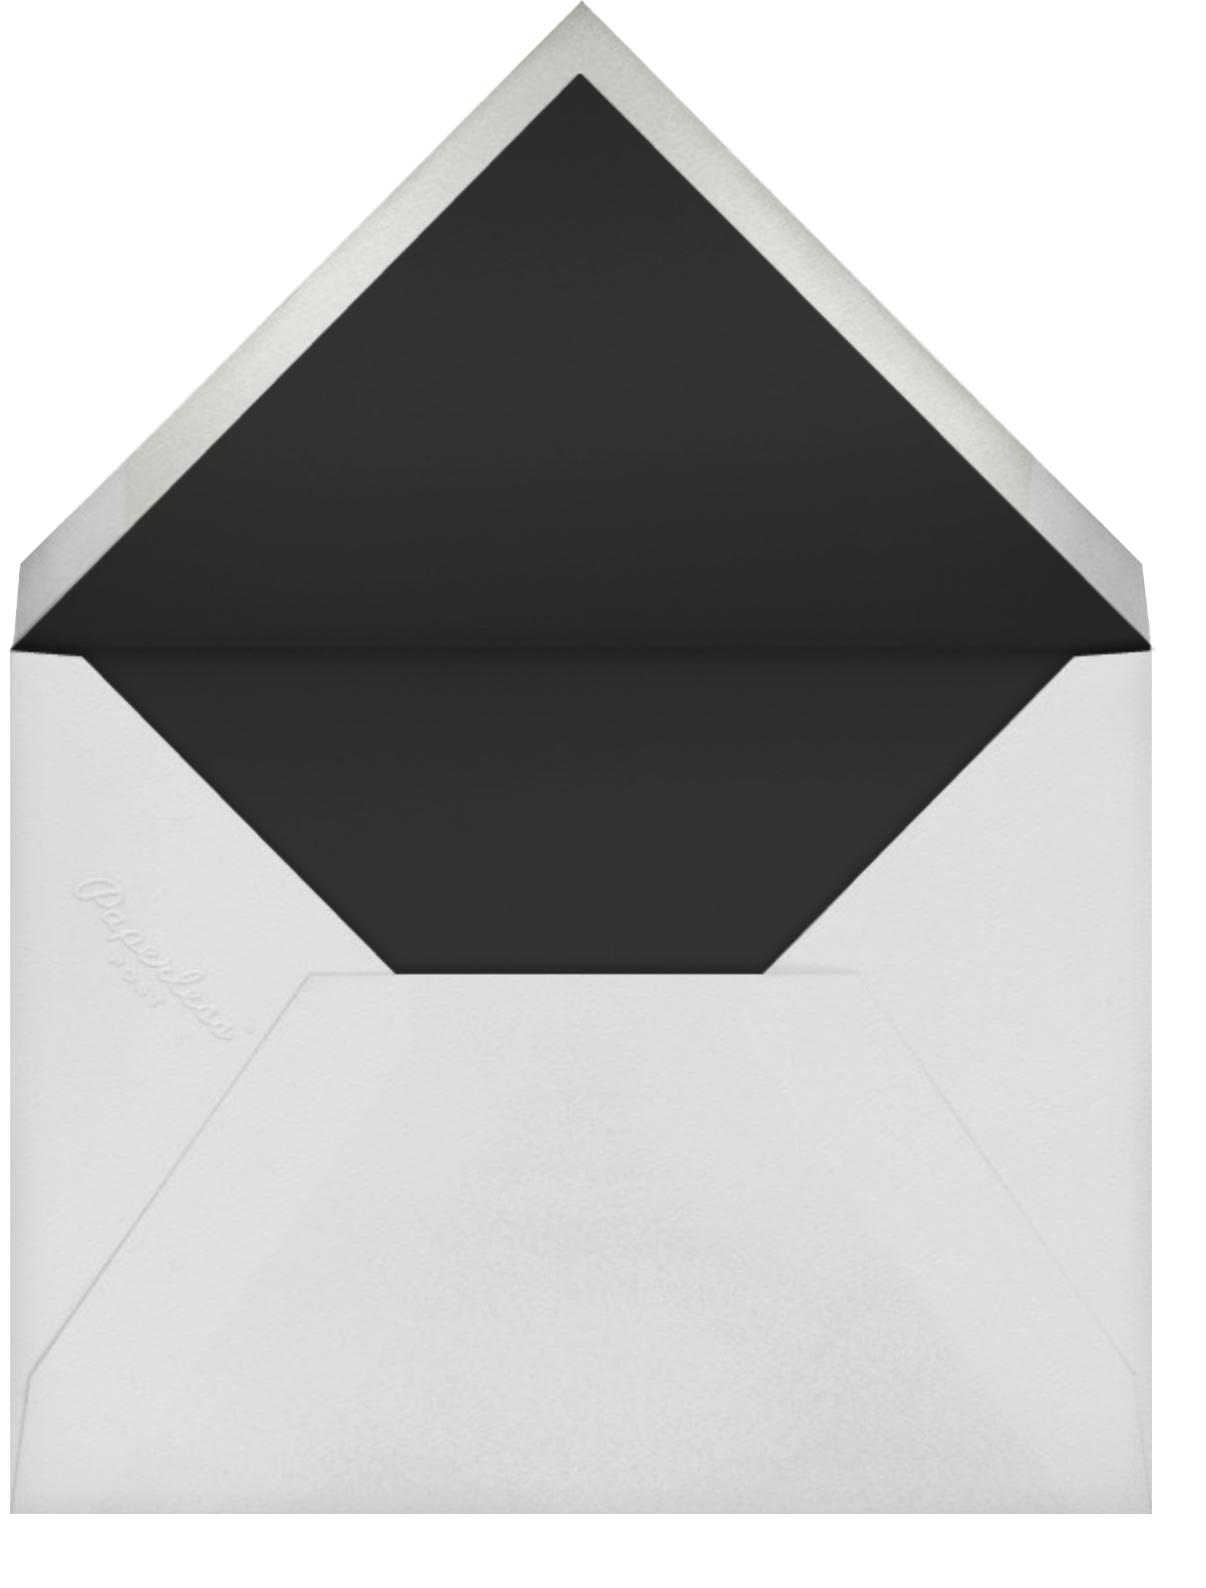 Principle (Stationery) - Black - Vera Wang - General - envelope back